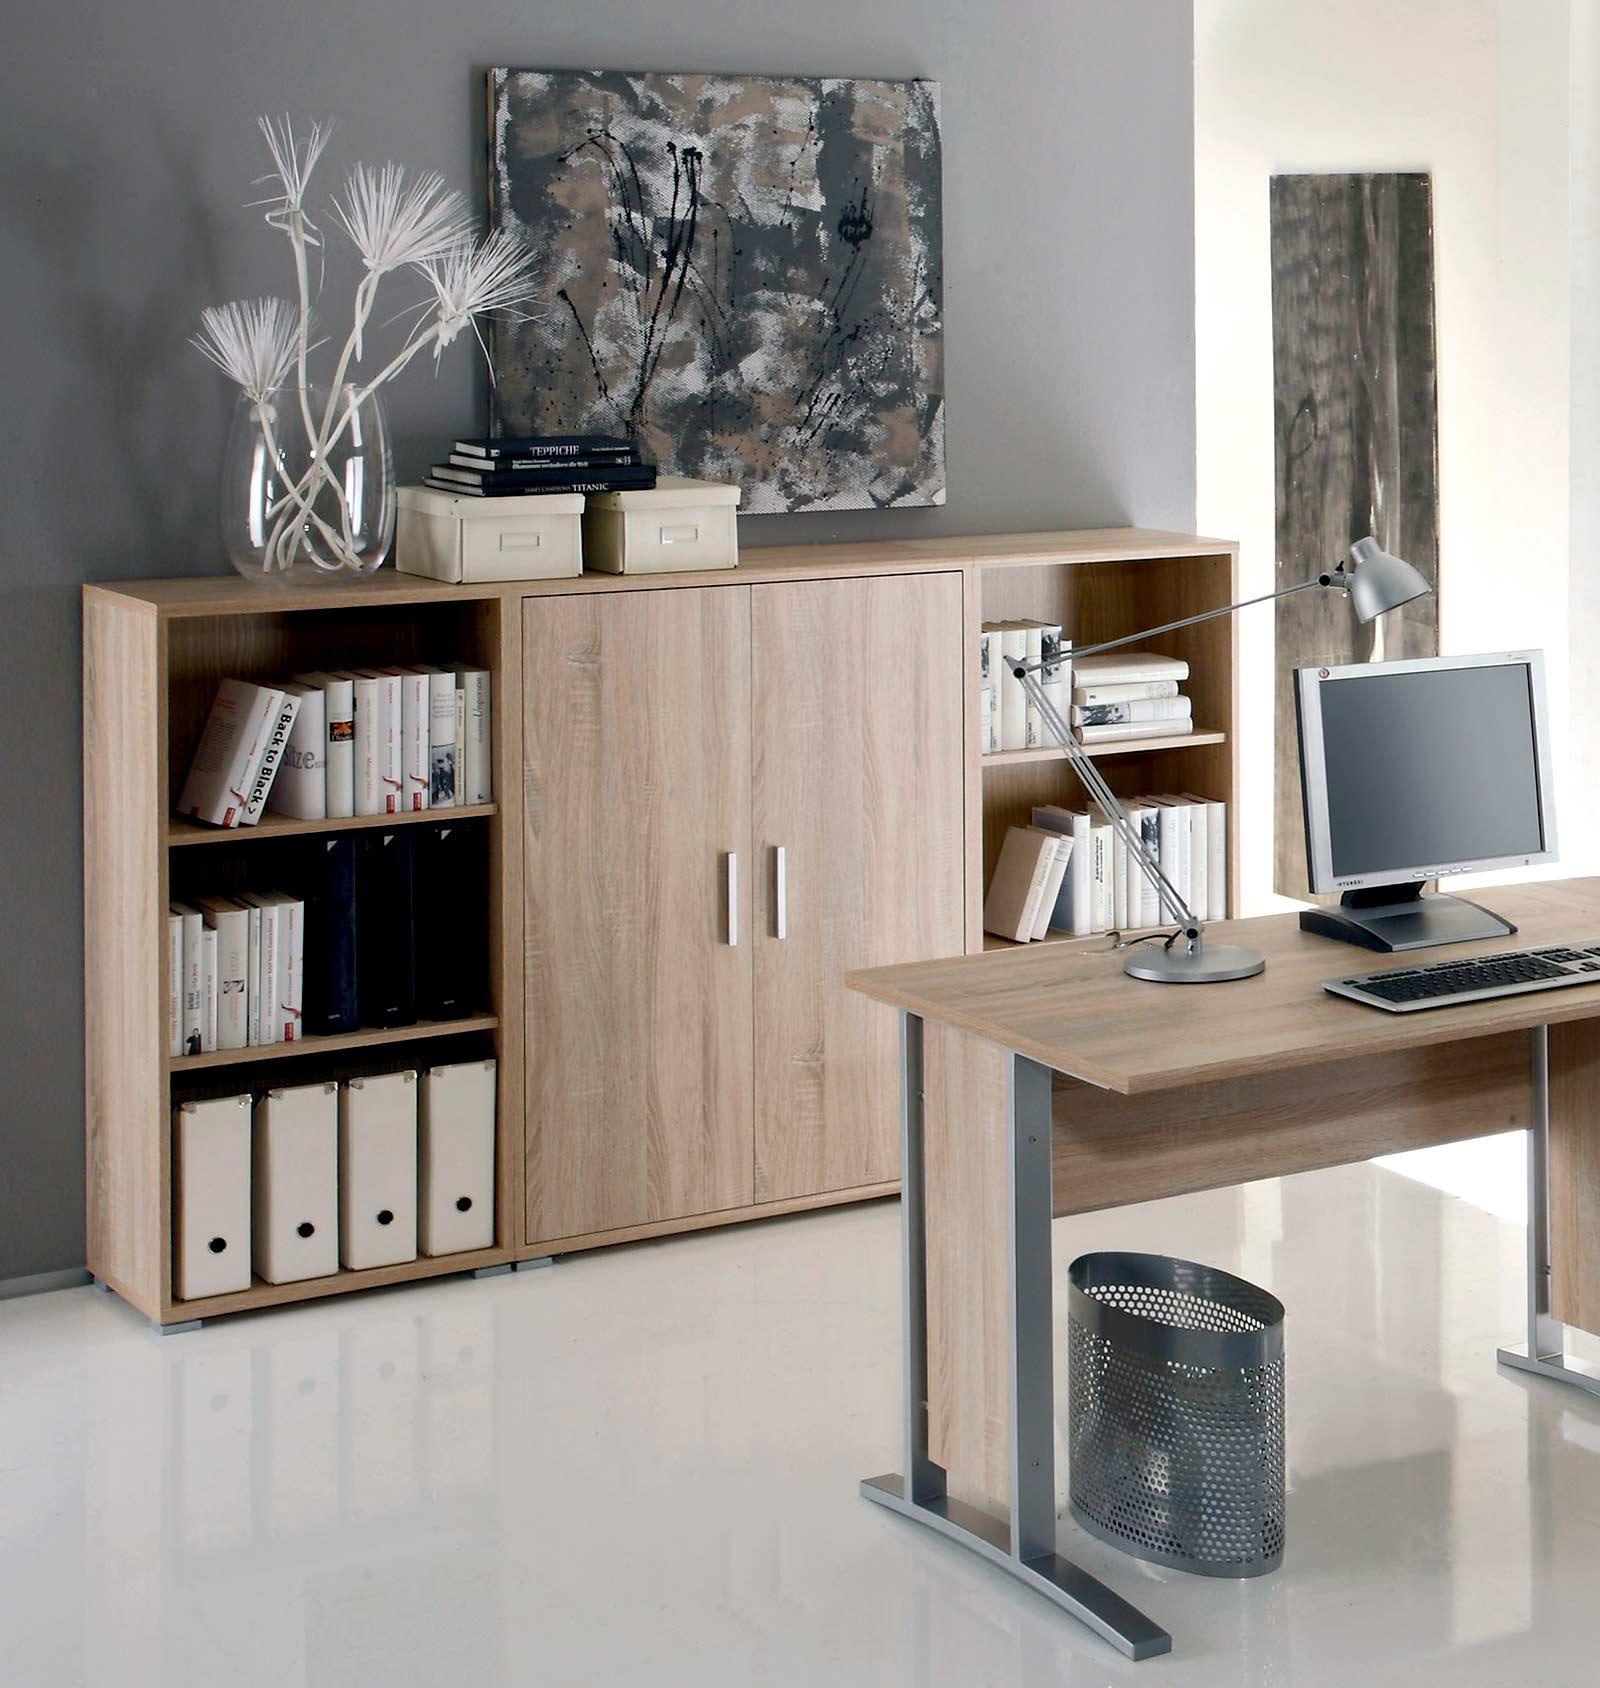 aktenschrank highboard regal schrank b rom bel office line eiche sonoma top ebay. Black Bedroom Furniture Sets. Home Design Ideas